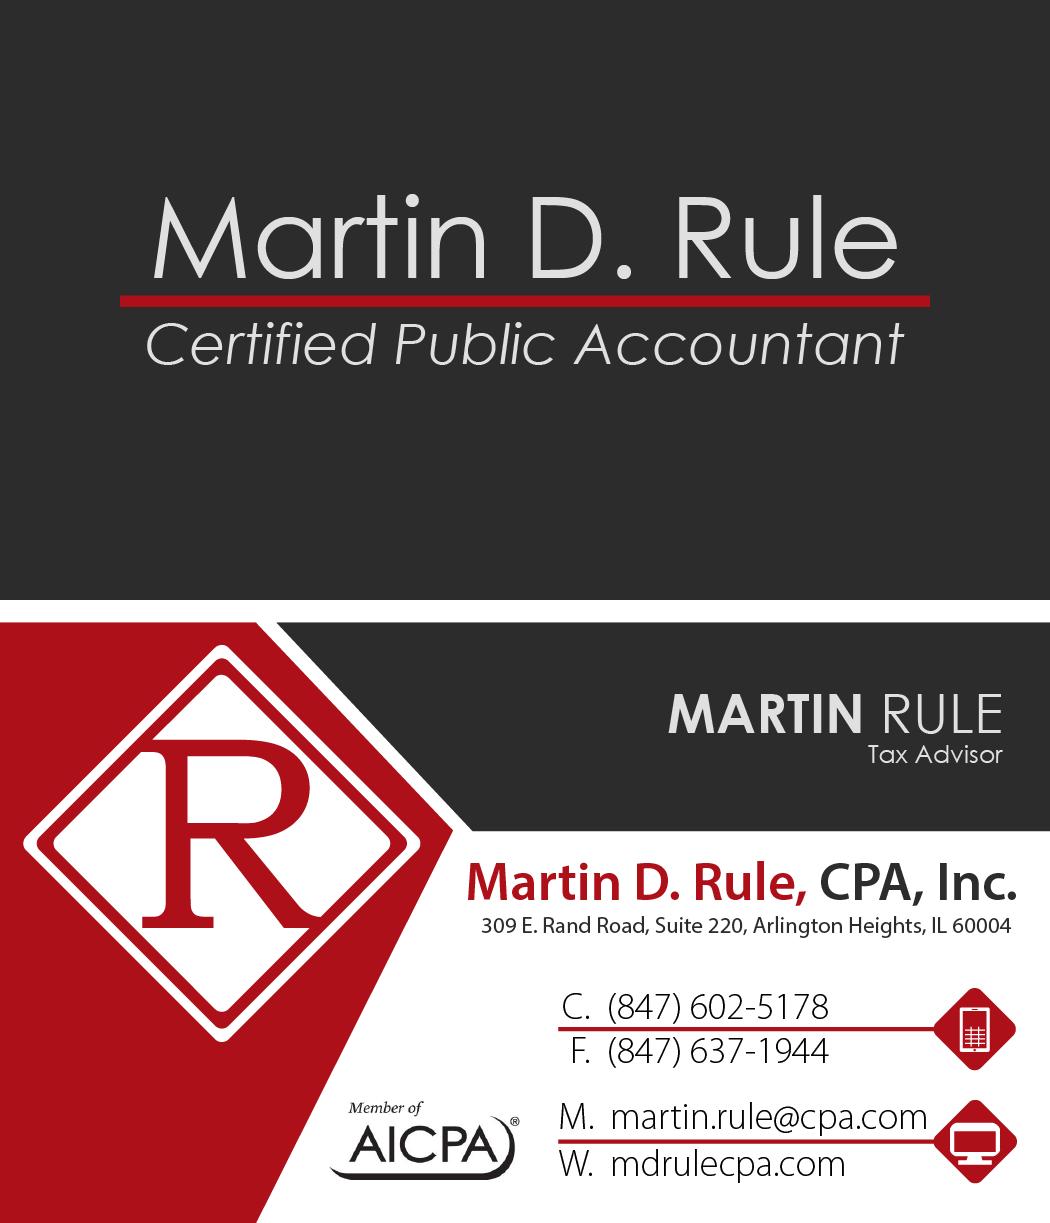 Martin D. Rule, CPA Inc. B-Cards – Ikarus Designs